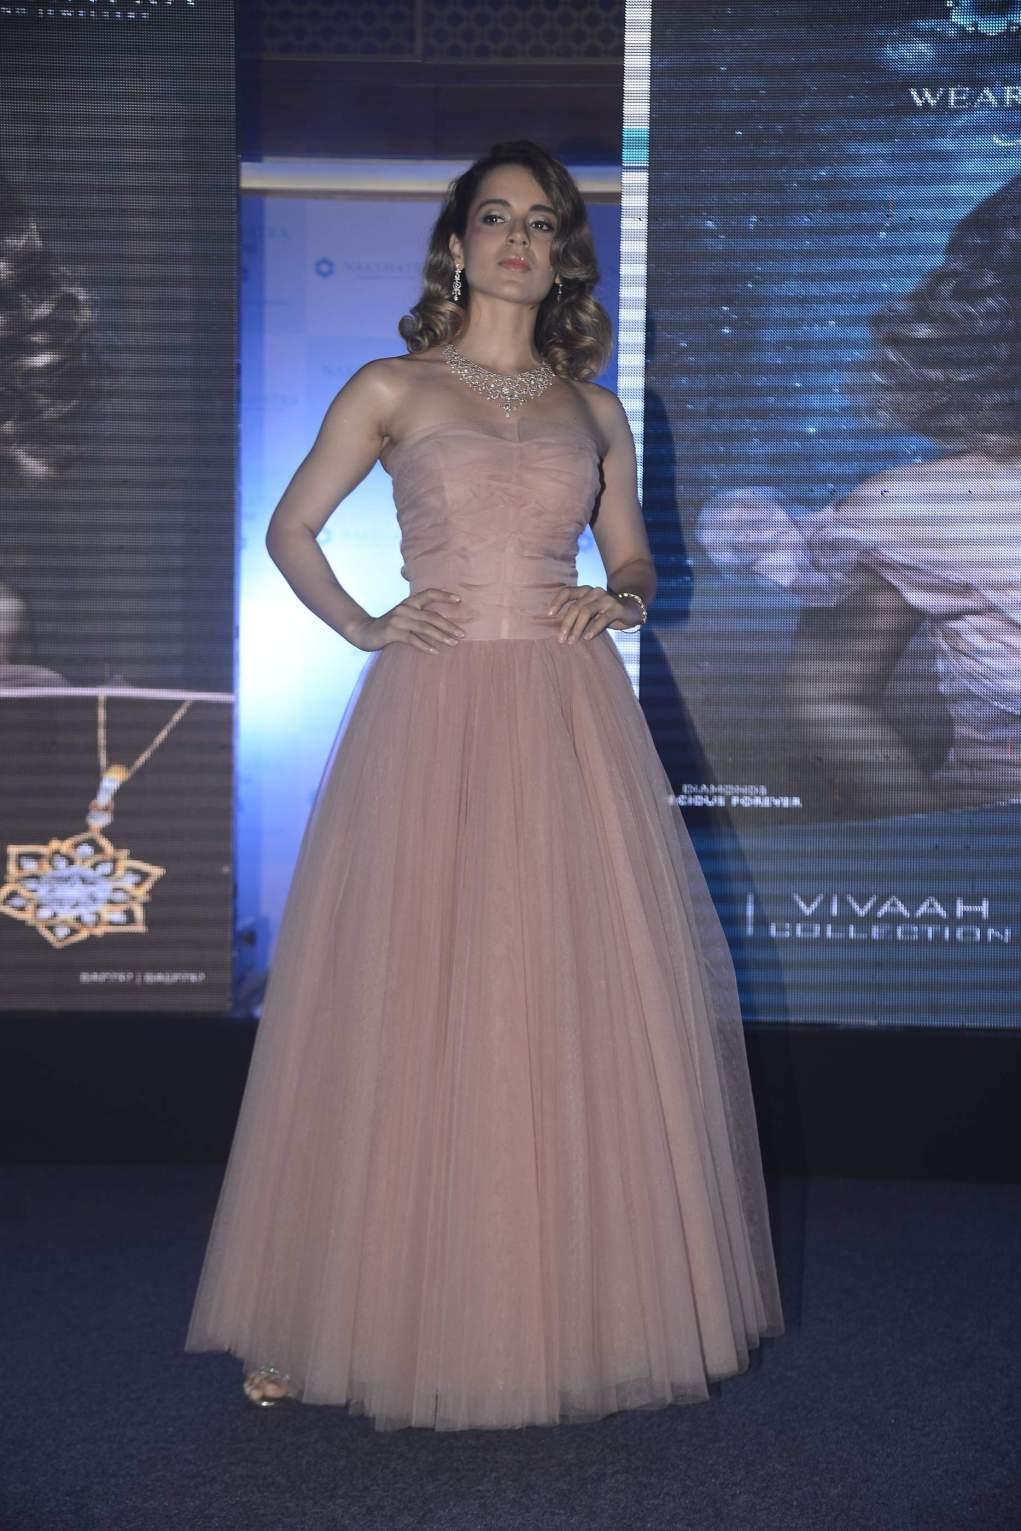 Kangana Ranaut Beautiful Kangana Ranaut Dazzles In Stunning Outfit | Nakshatra Kangana Nakshatra 3